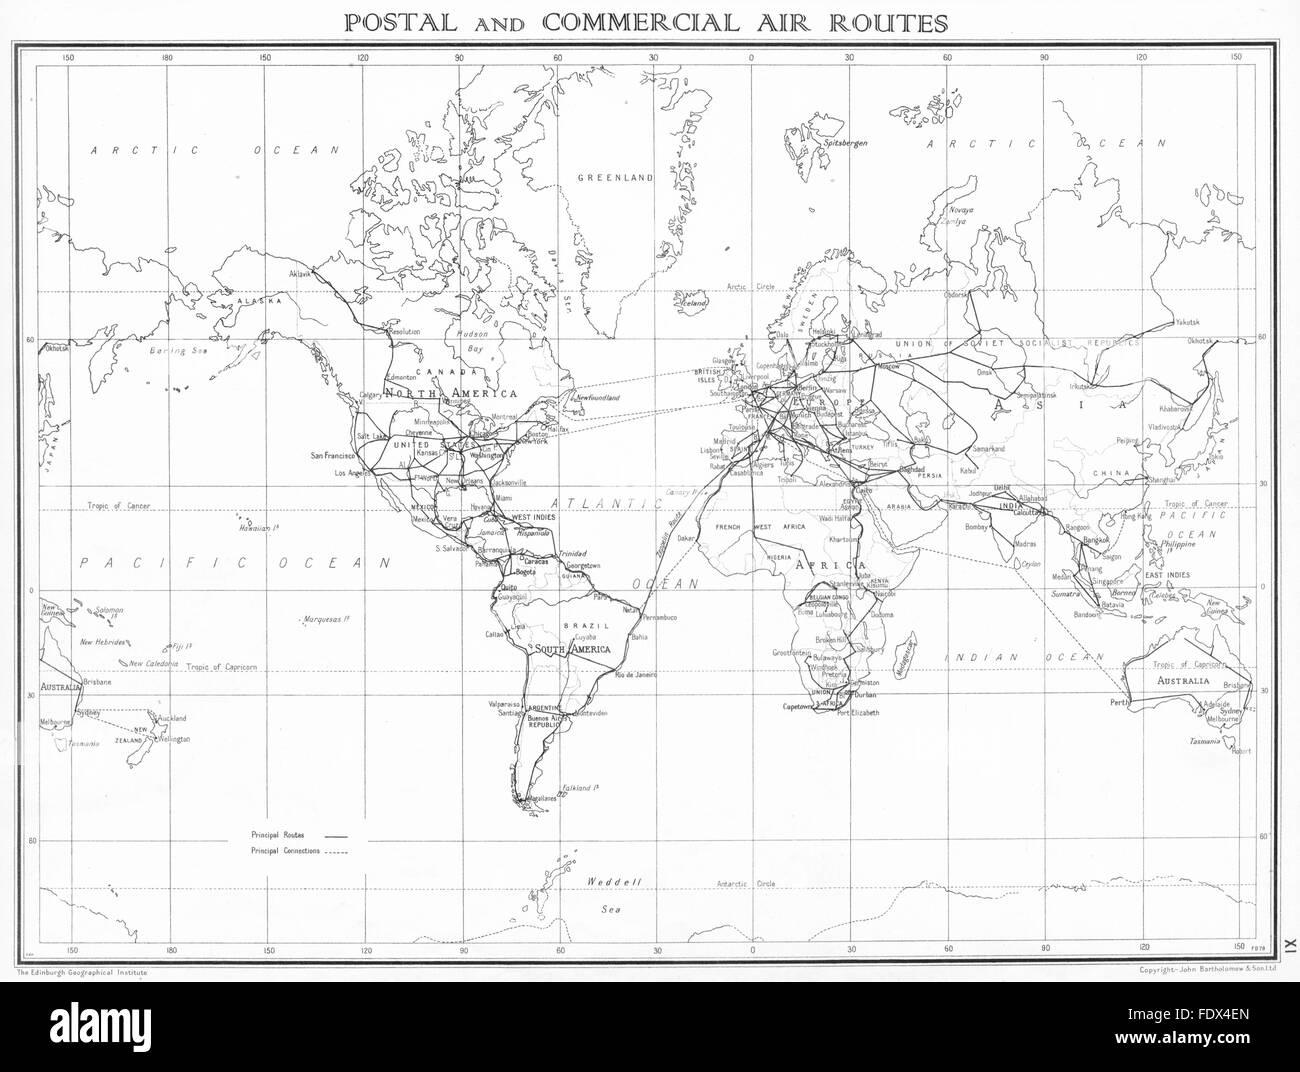 hight resolution of art international radio telephone service 1938 old vintage map plan chart world